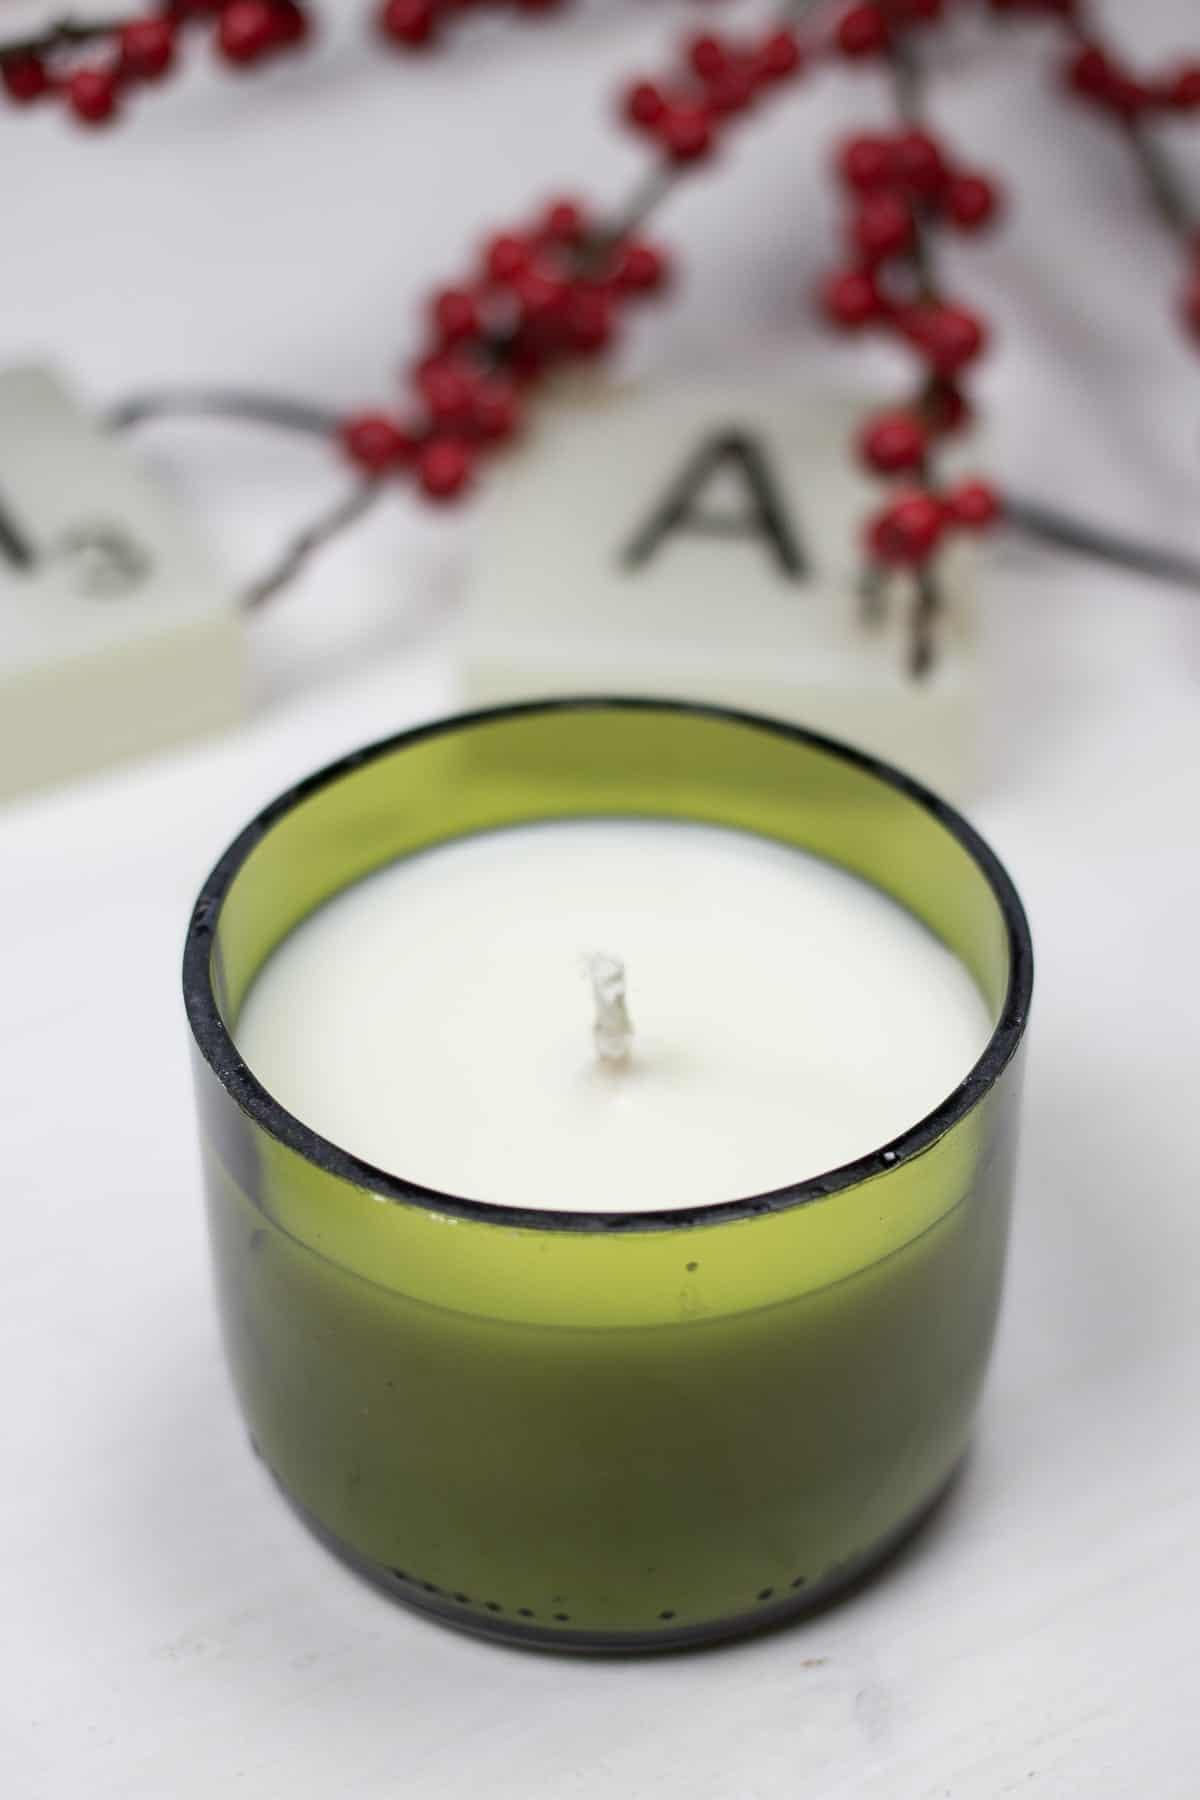 Flaschen-Upcycling-Kerzen | SOAP|KITCHEN|STYLE